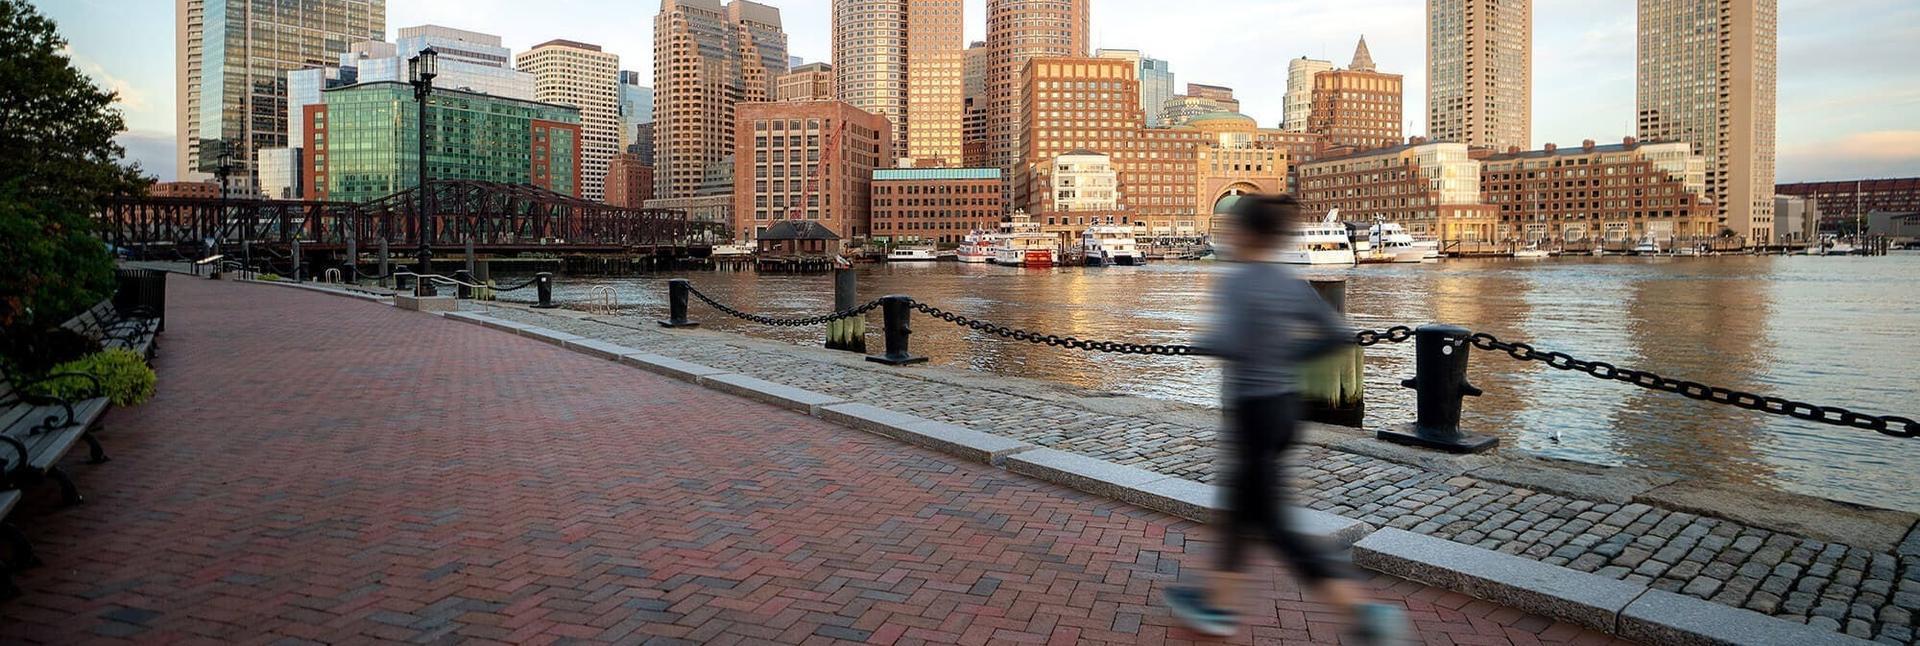 rra-location-hero-boston.jpg